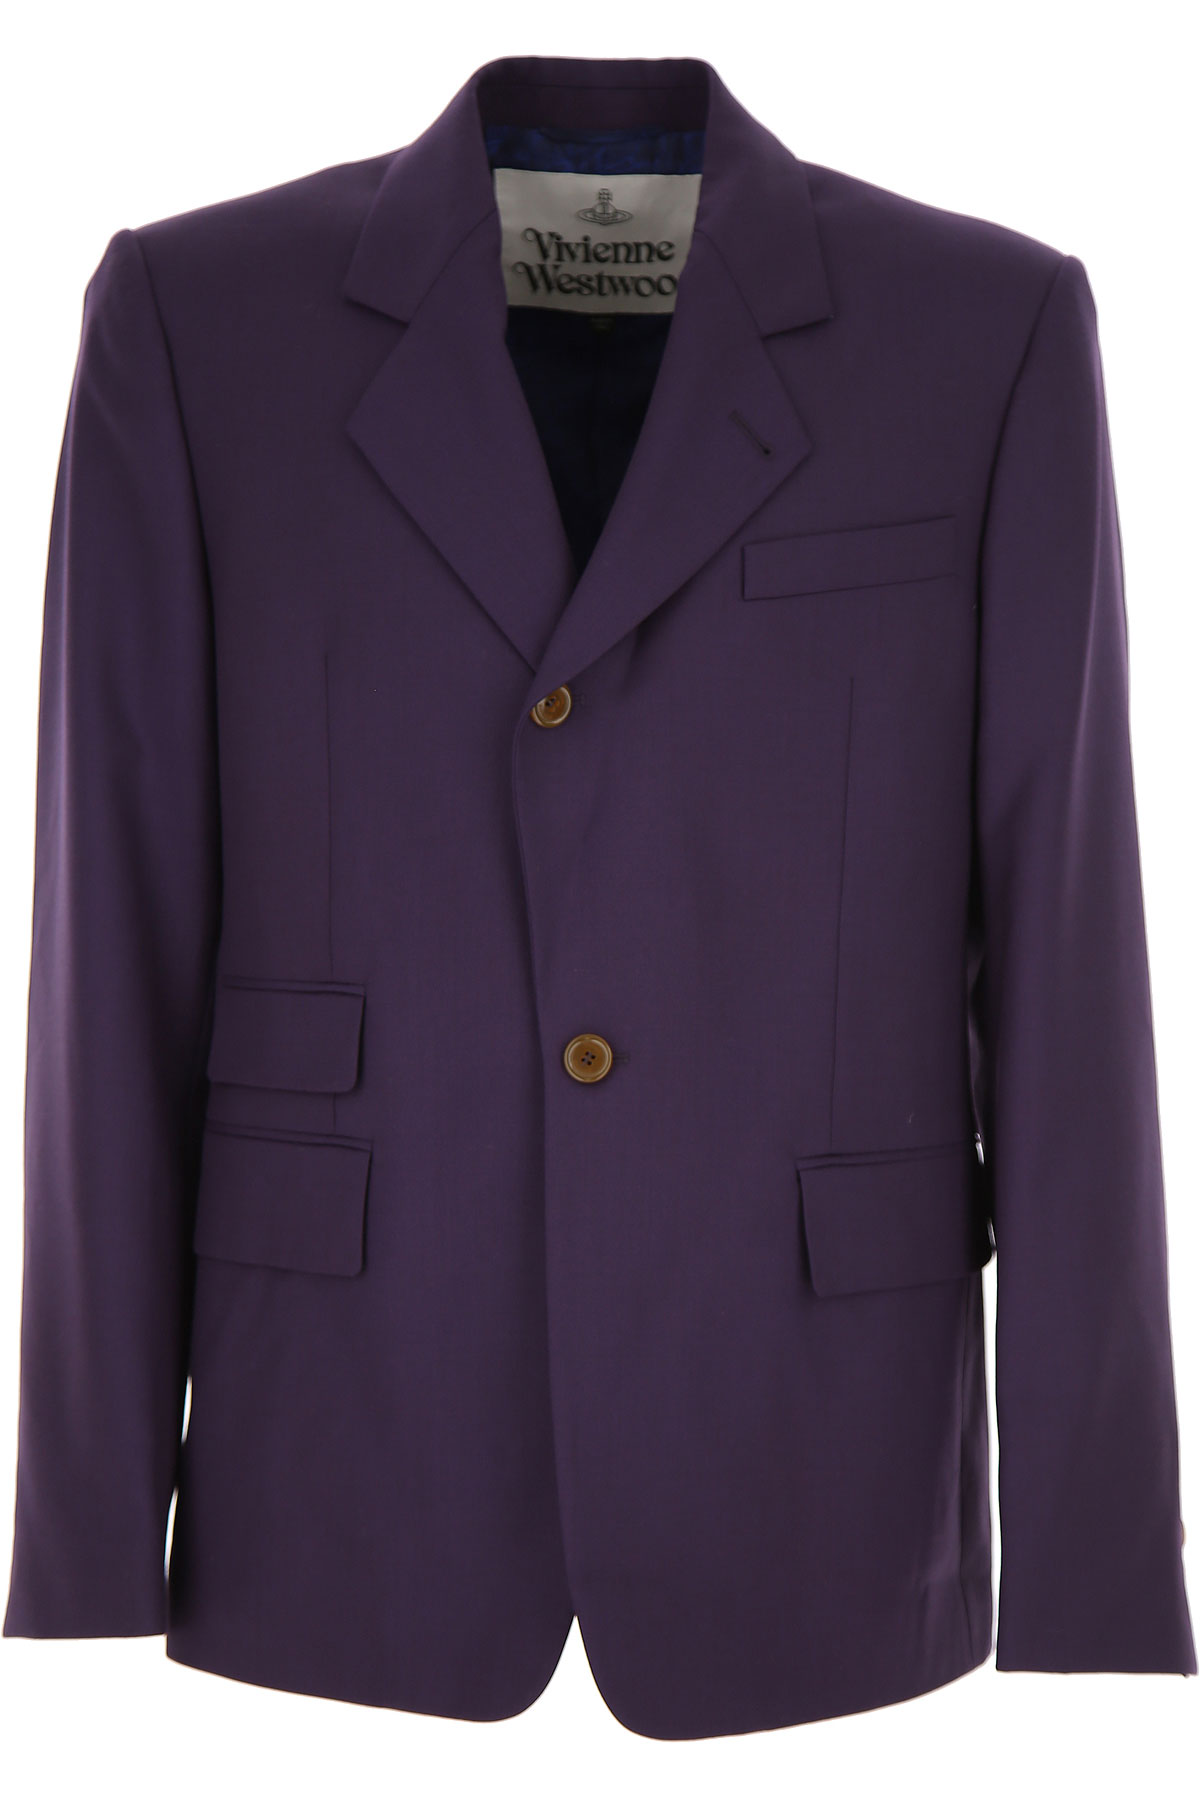 Vivienne Westwood Blazer for Men, Sport Coat, Blue Violet, Virgin wool, 2019, L XXL